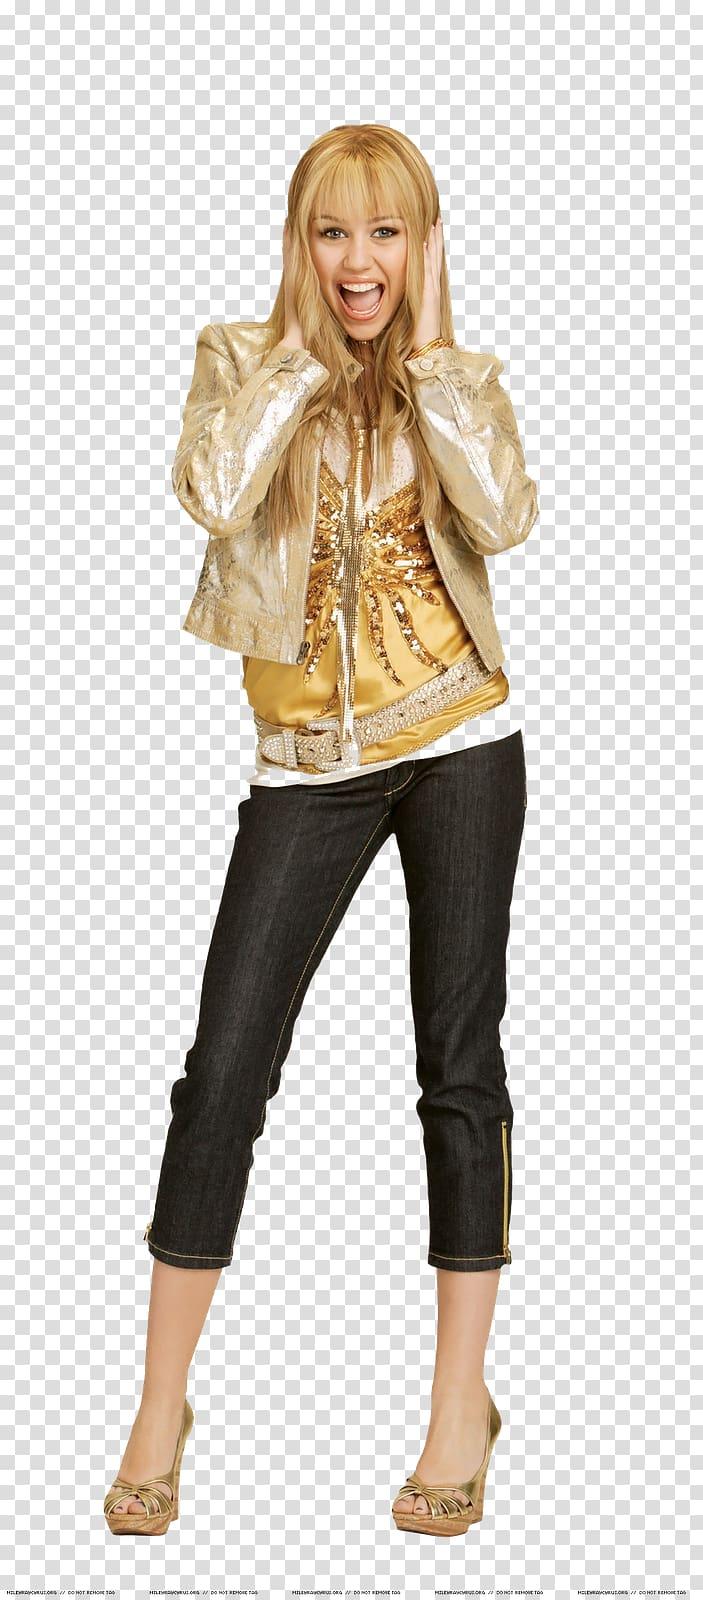 Hannah Montana 2: Meet Miley Cyrus Hannah Montana, Season 2 Hannah.